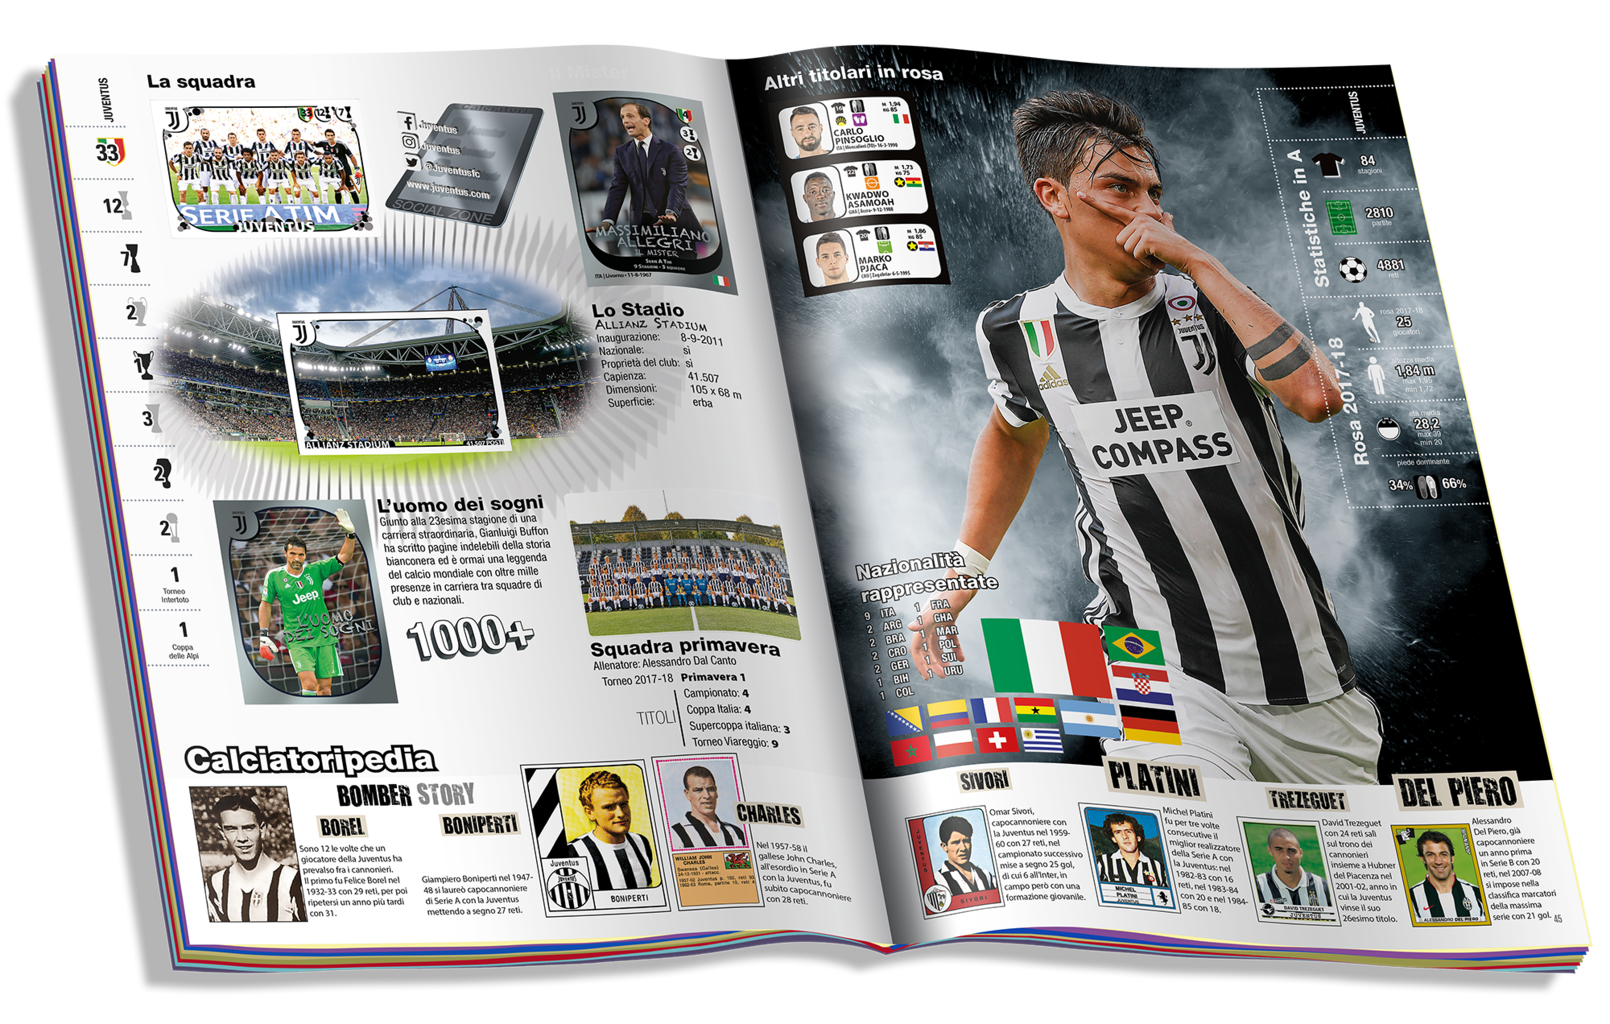 Juventus p3-4-Calciatori-Panini-2017-2018 (FILEminimizer)